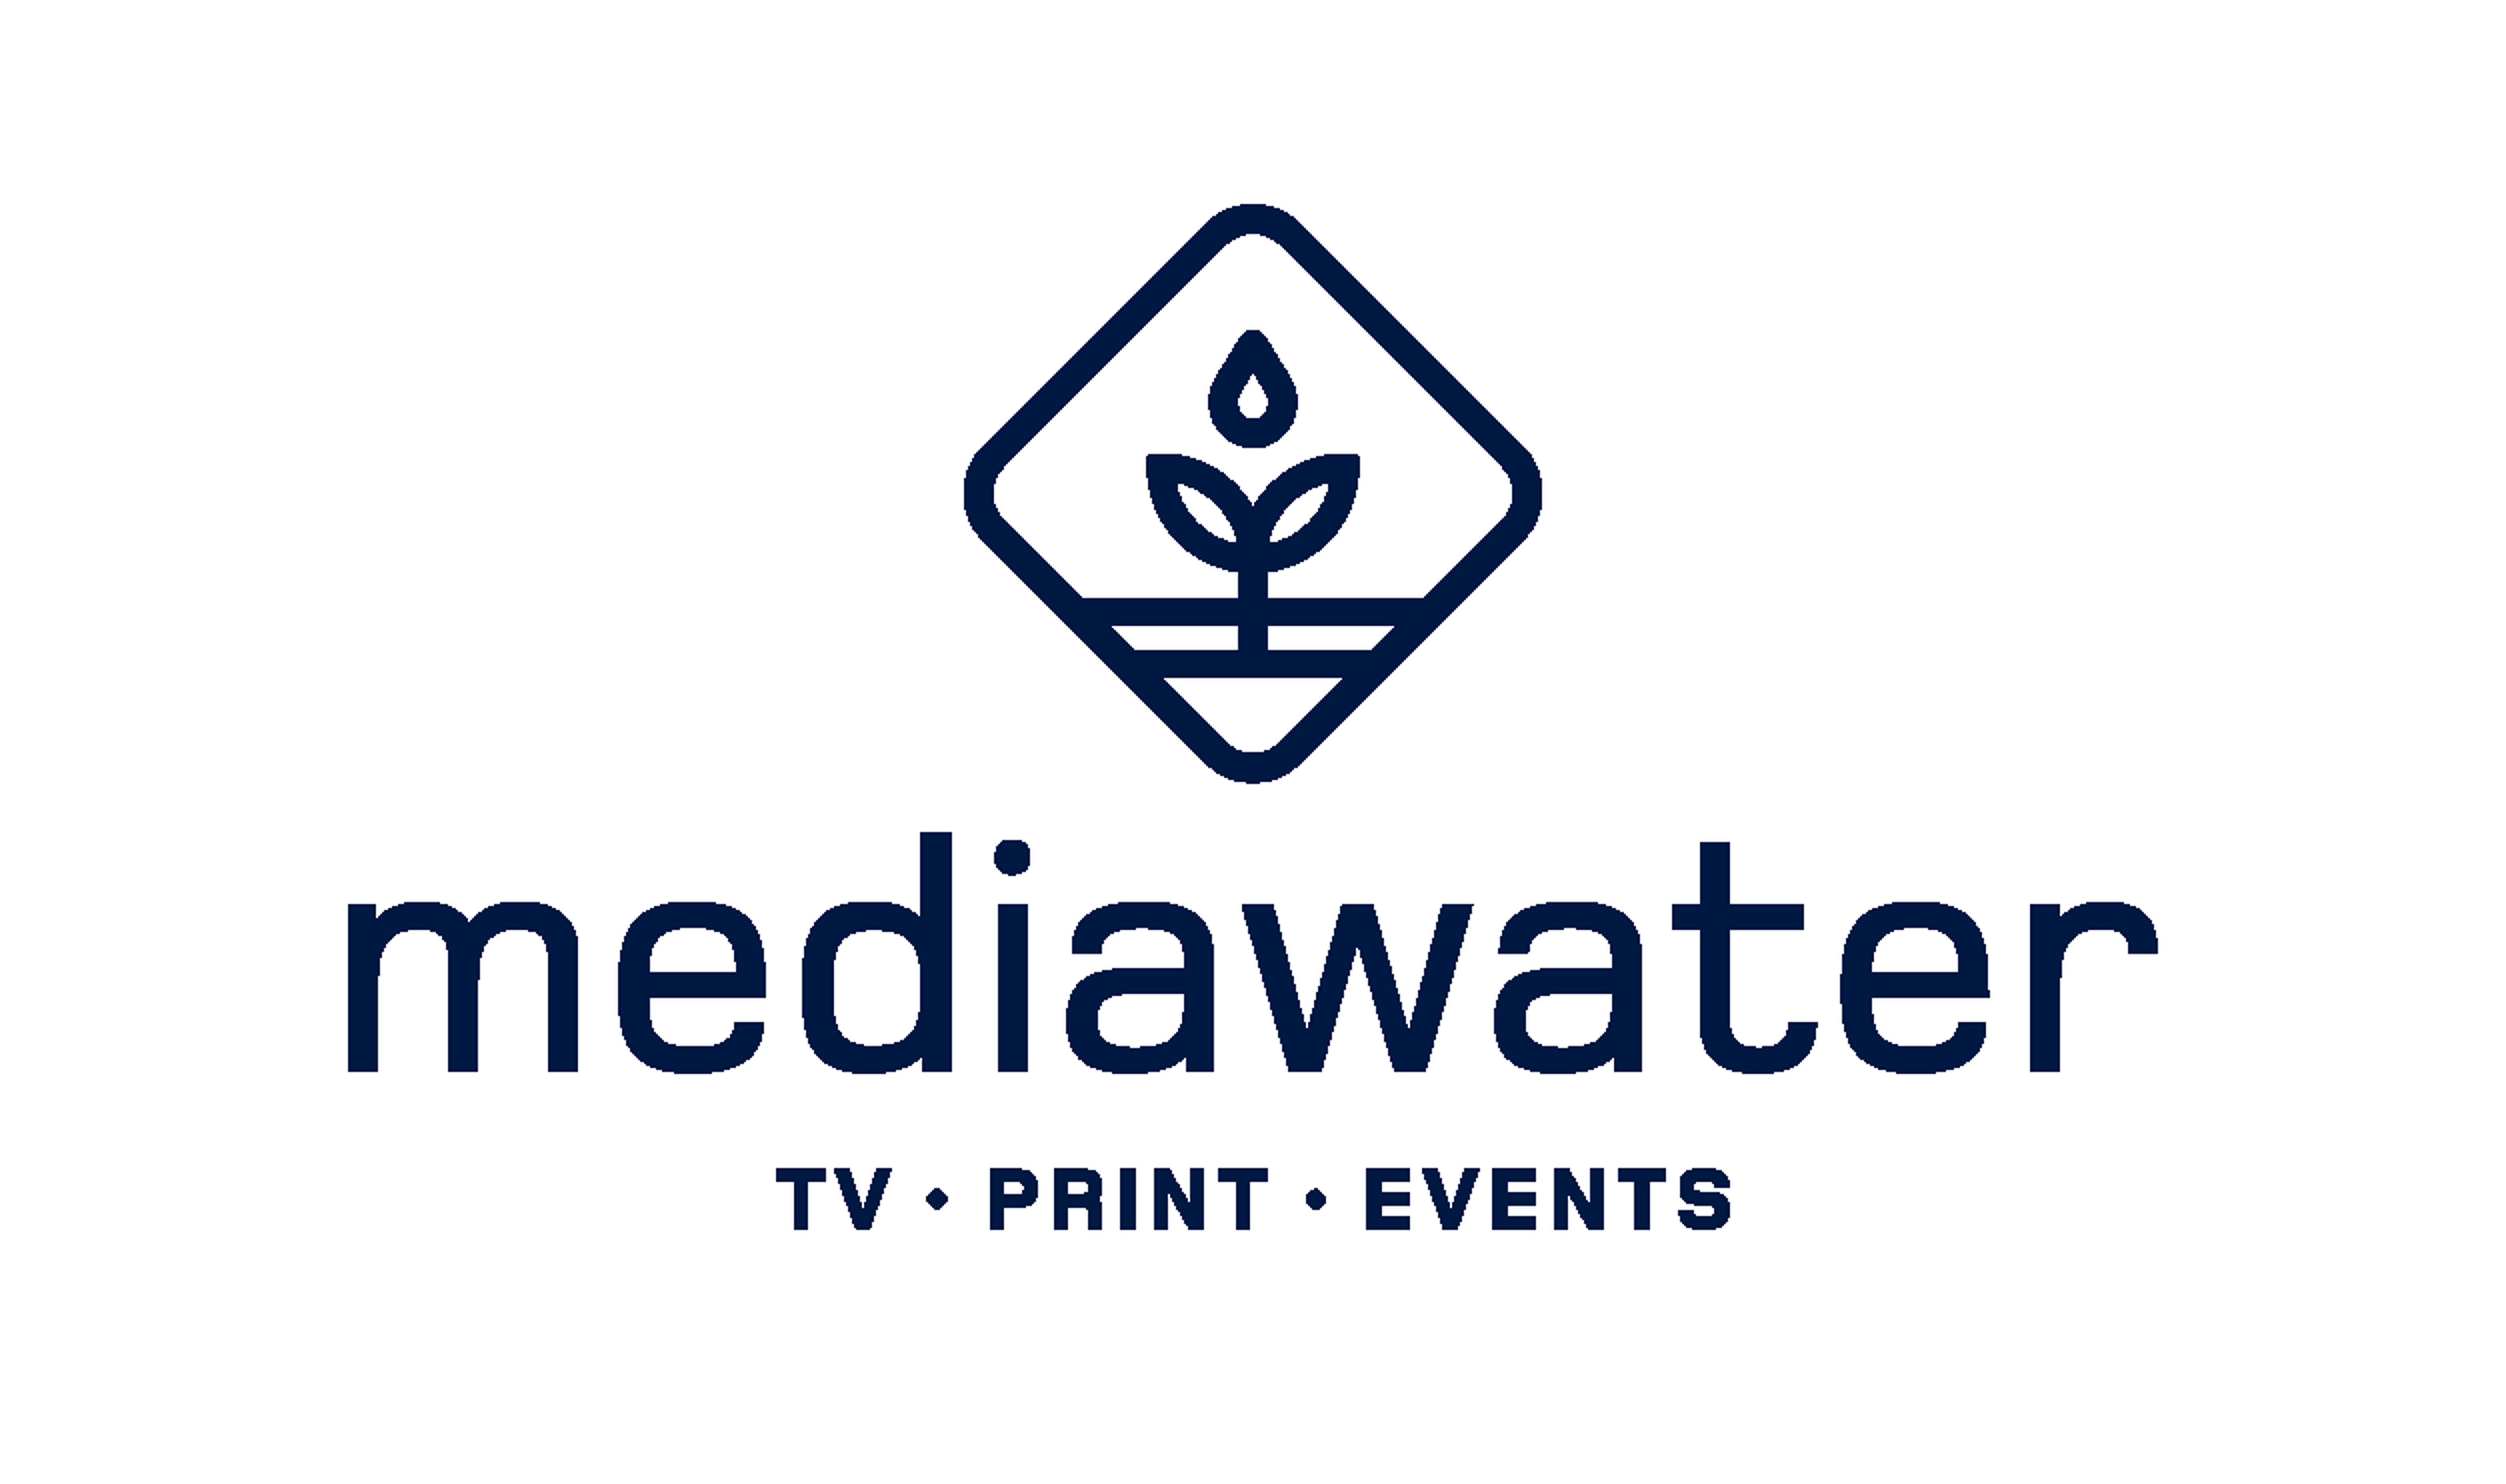 Mediawater